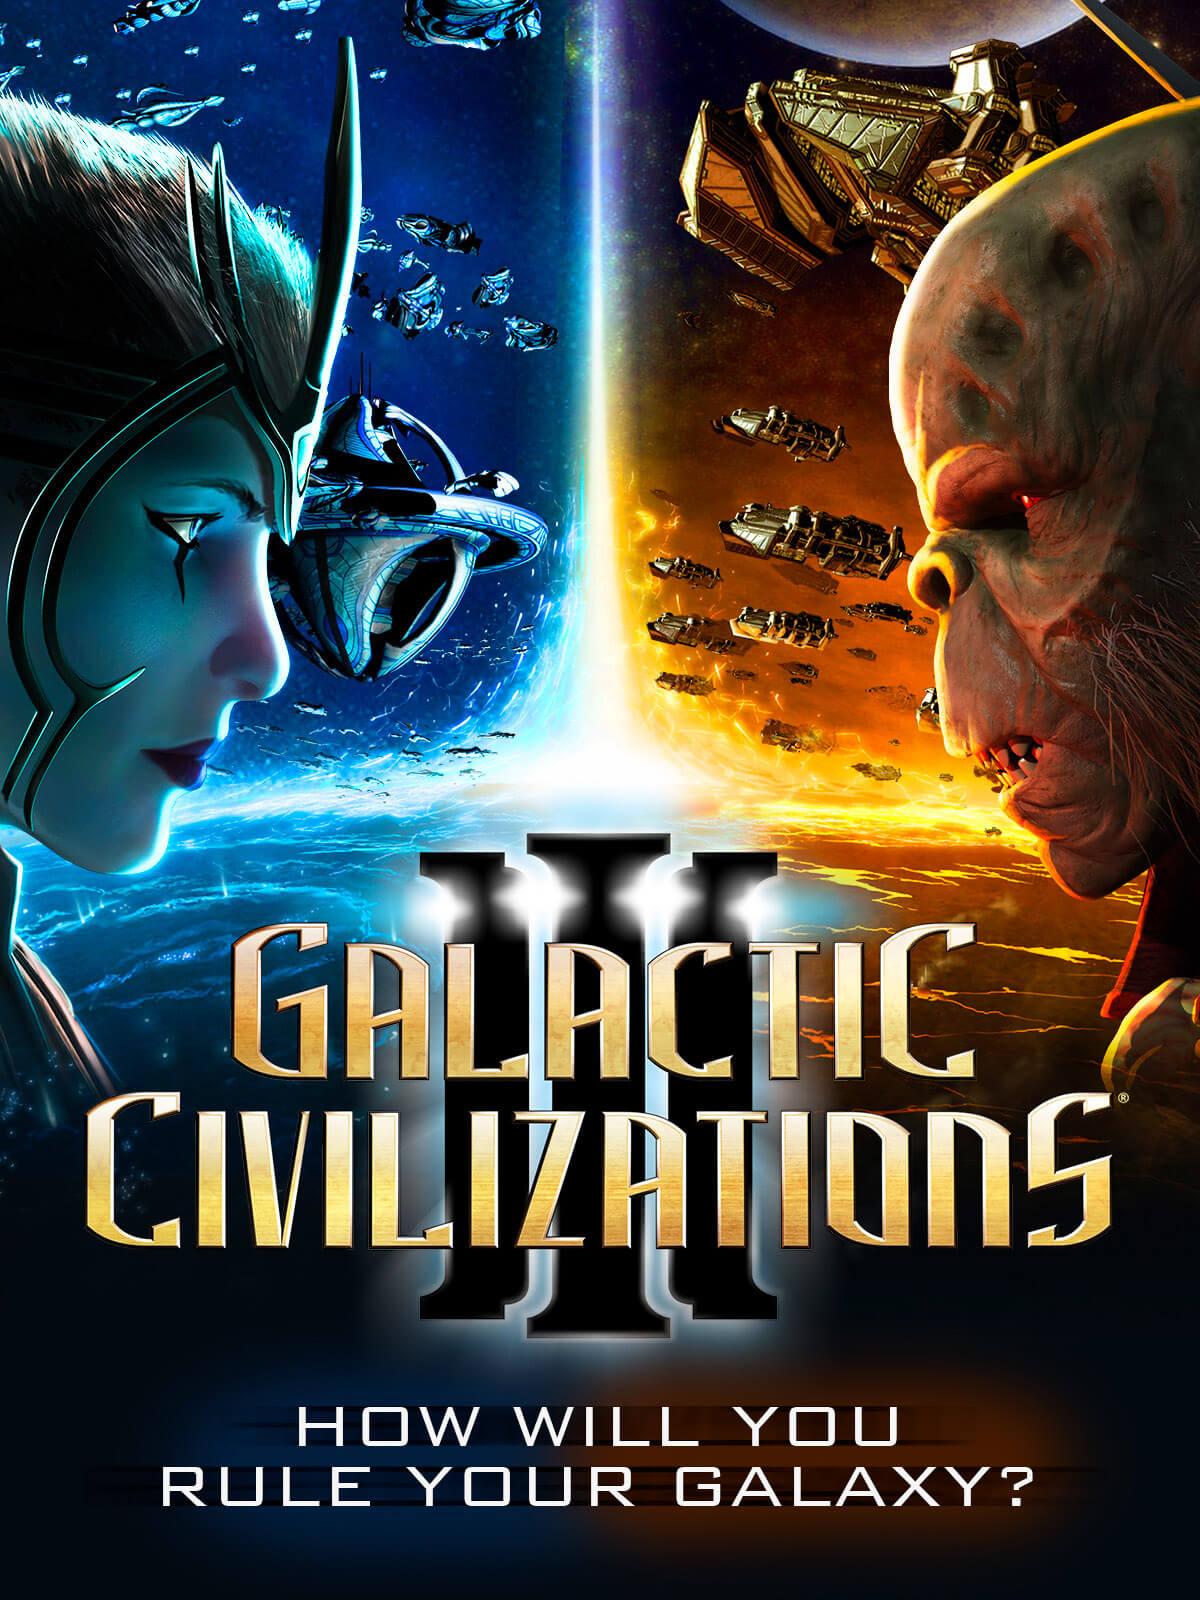 [Gratis] Galactic Civilizations III vanaf 21 januari @ epic games store